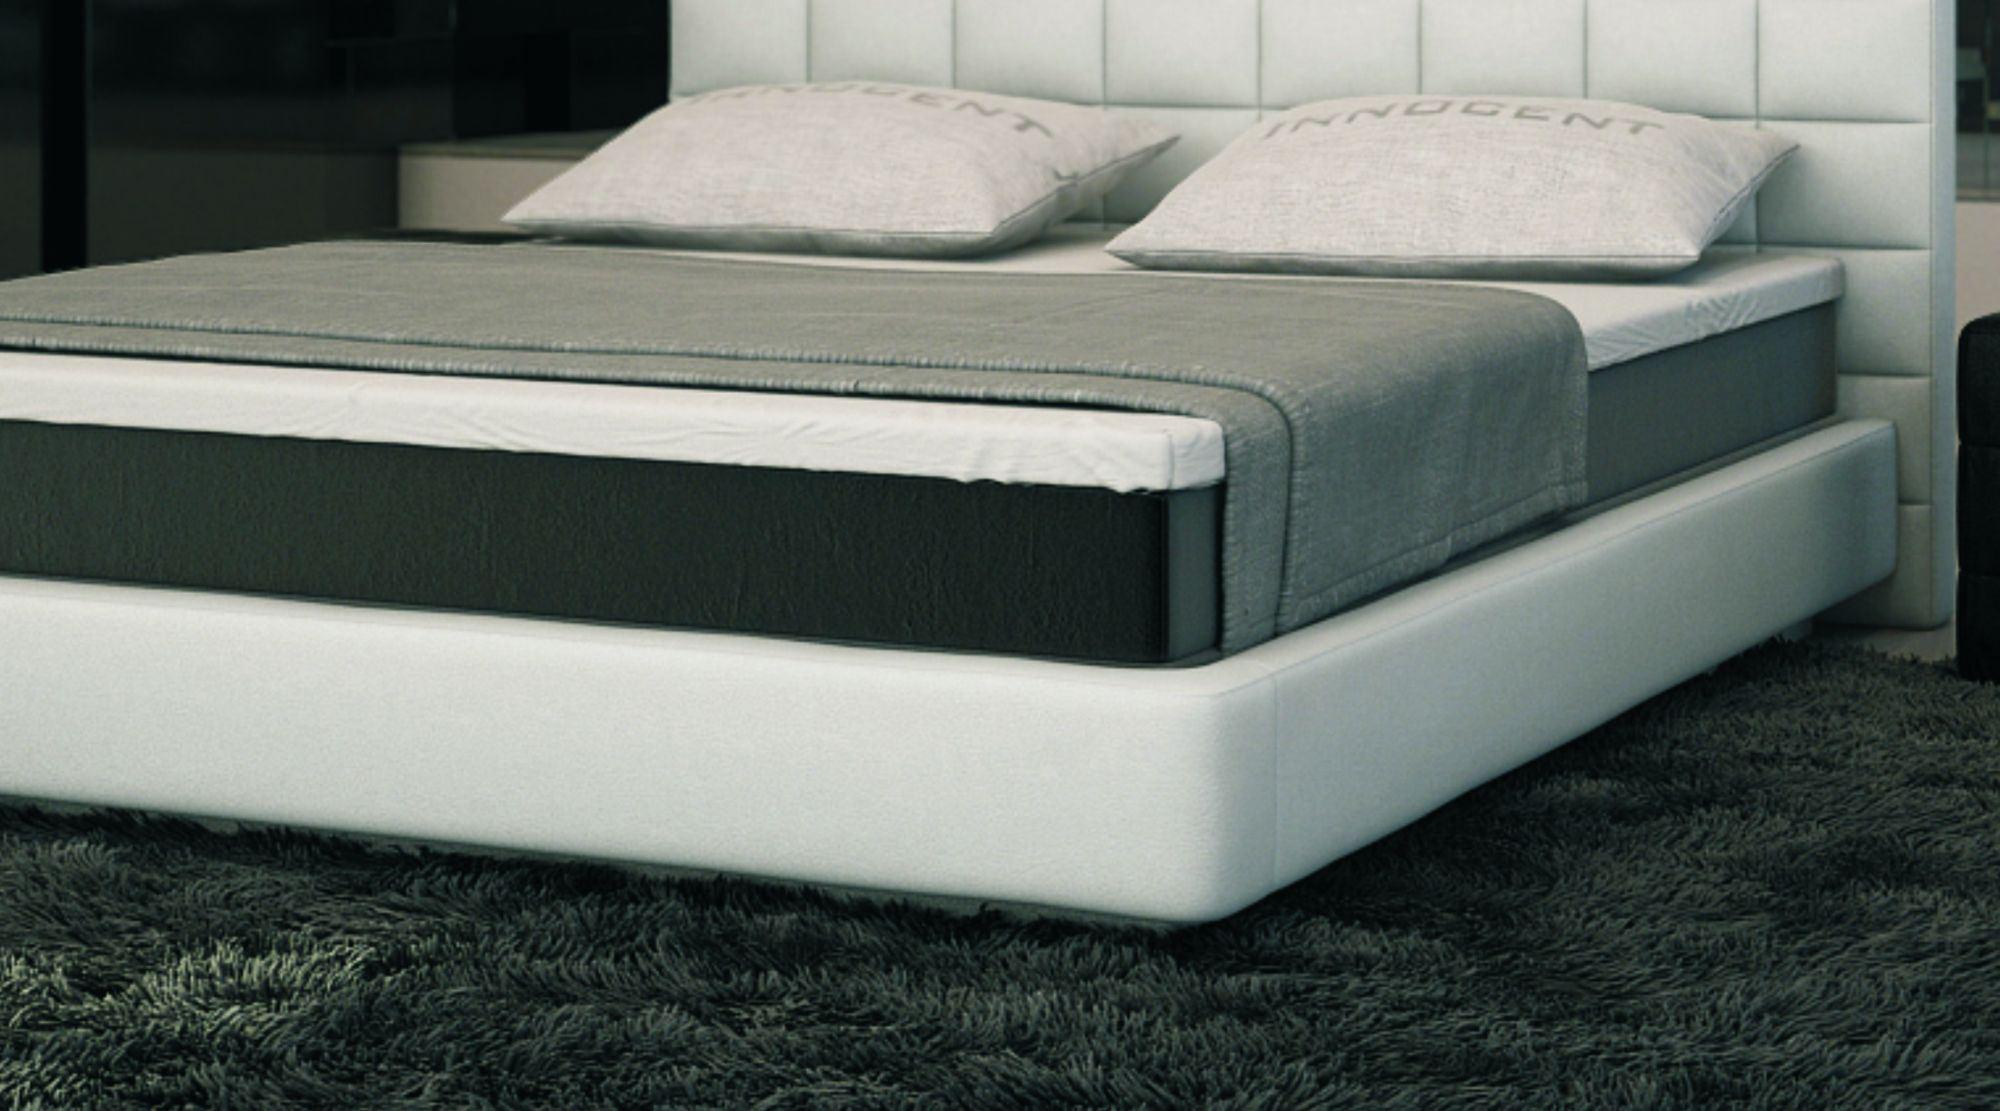 Cama box spring cama diseno aquila cama tapizada de diseno - Sofa cama aquila ...